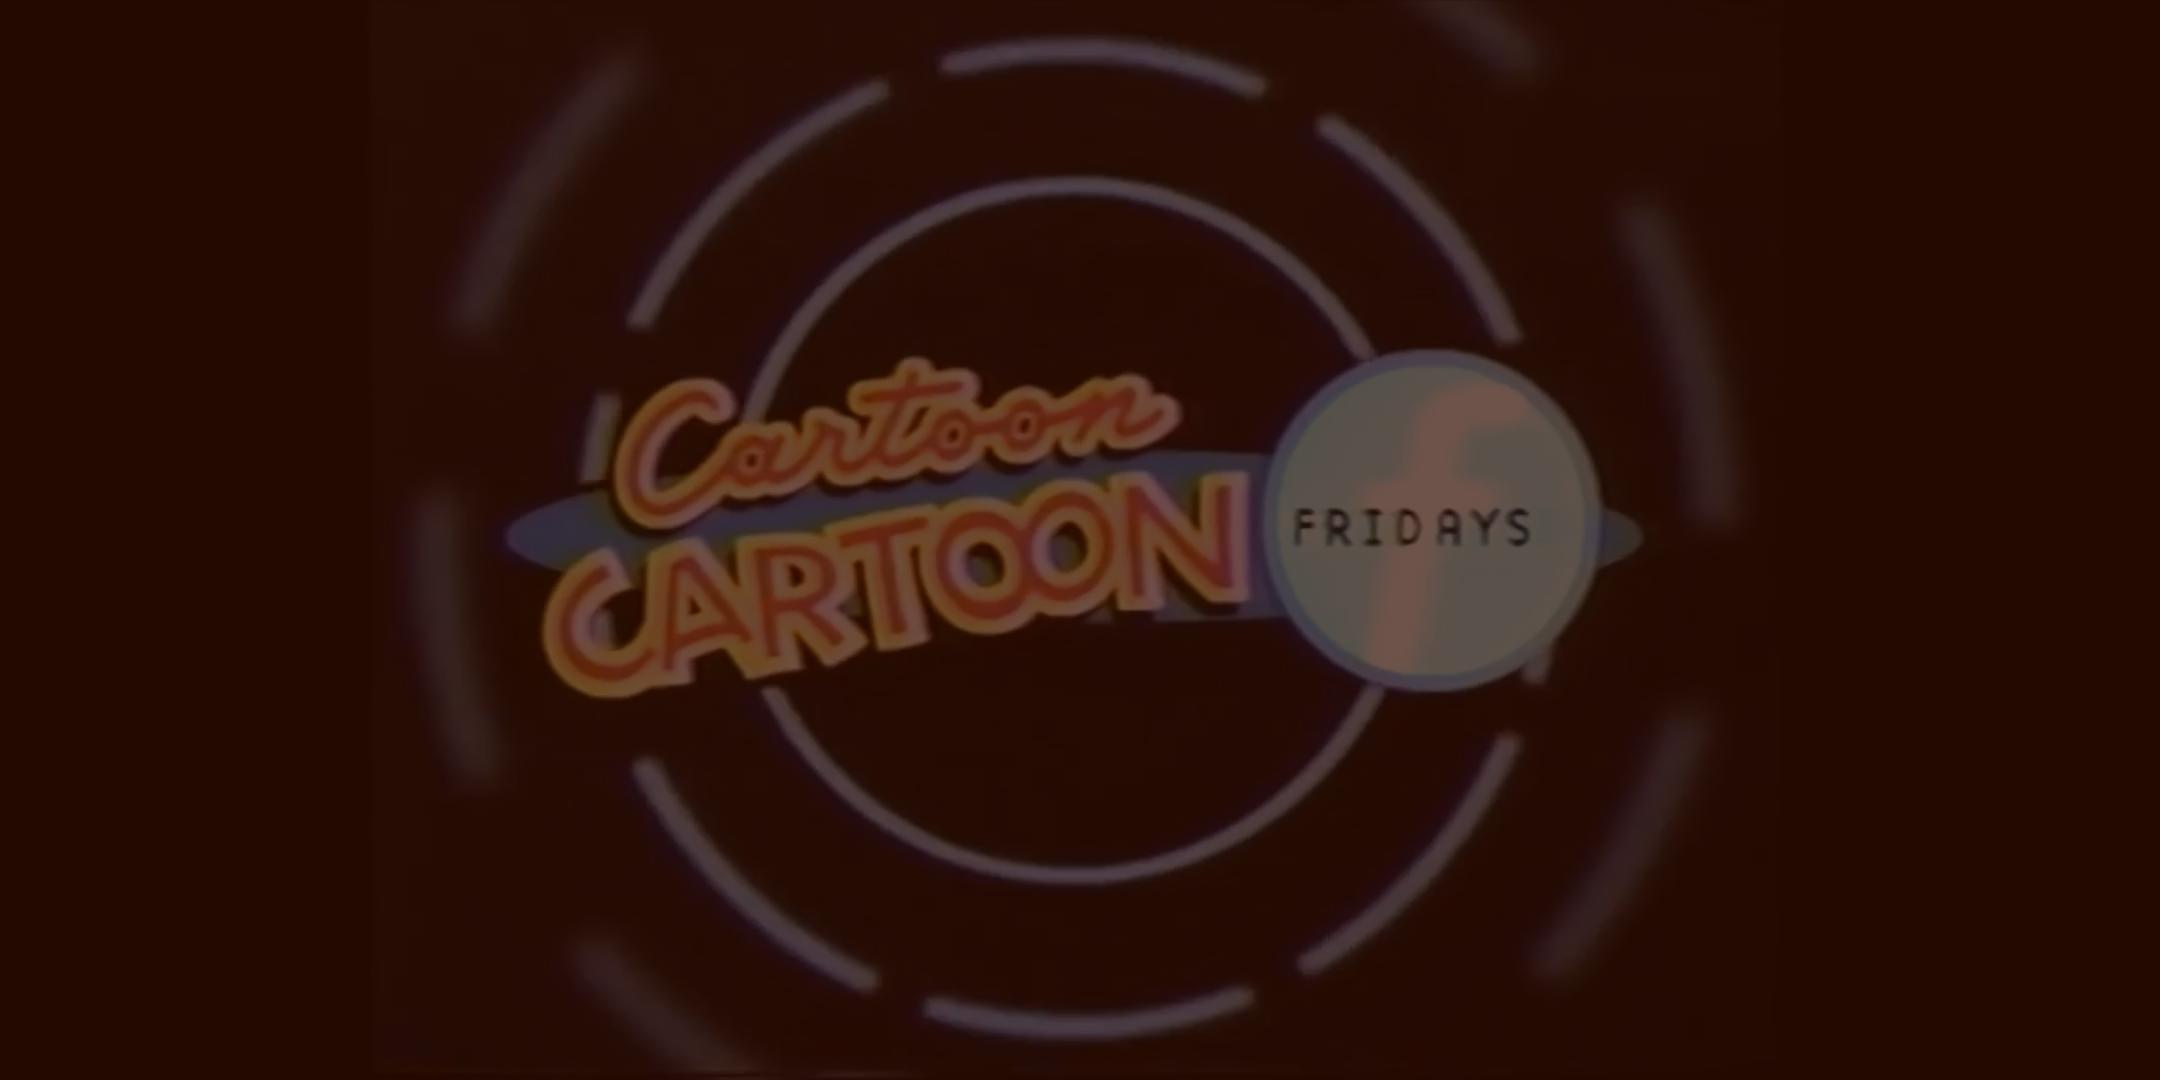 Cartoon Cartoon Fridays (2000)